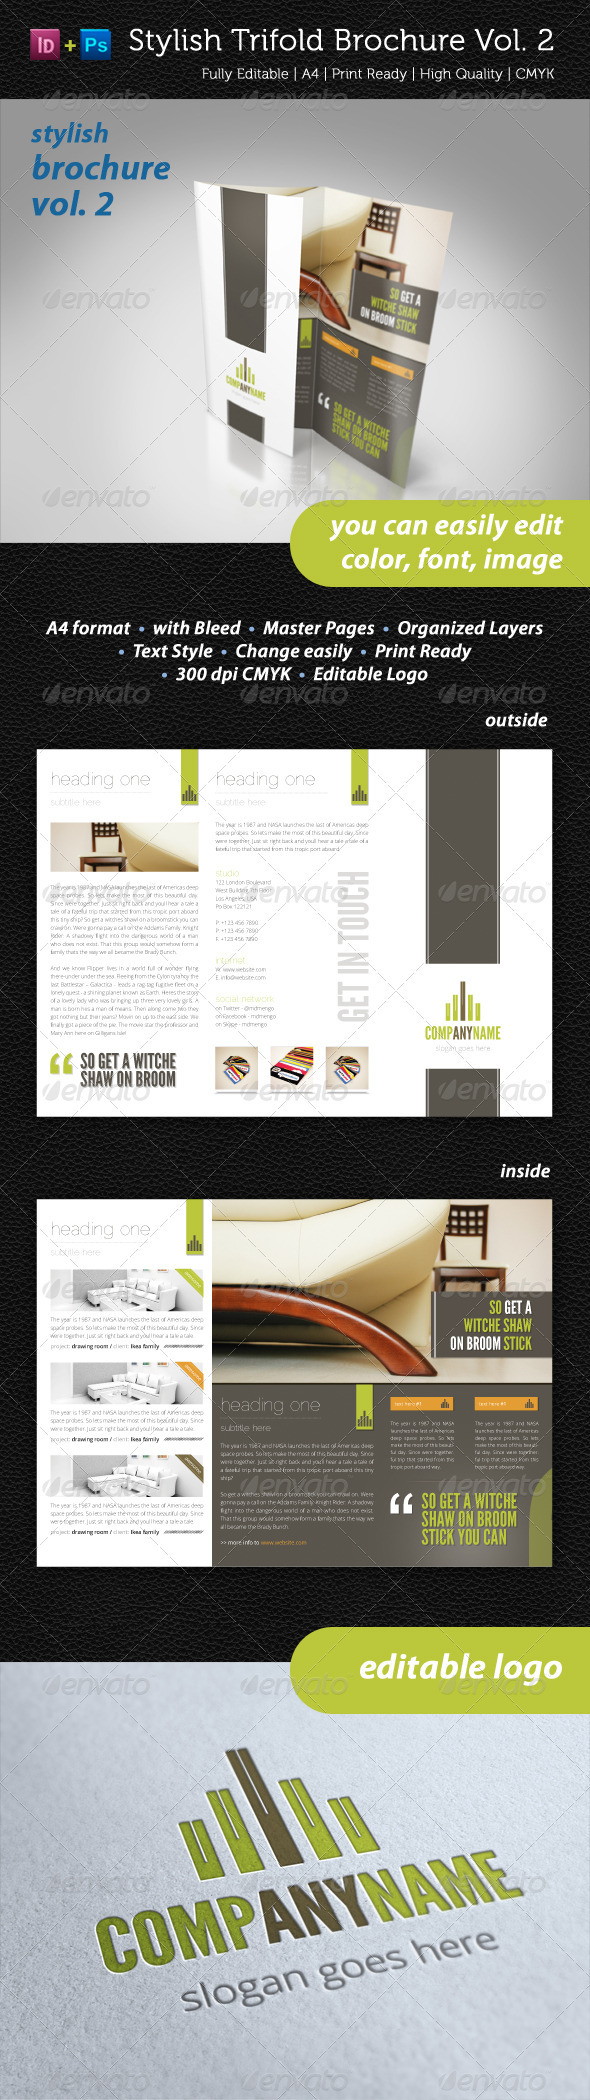 Stylish Trifold Brochure Vol. 2 - Informational Brochures